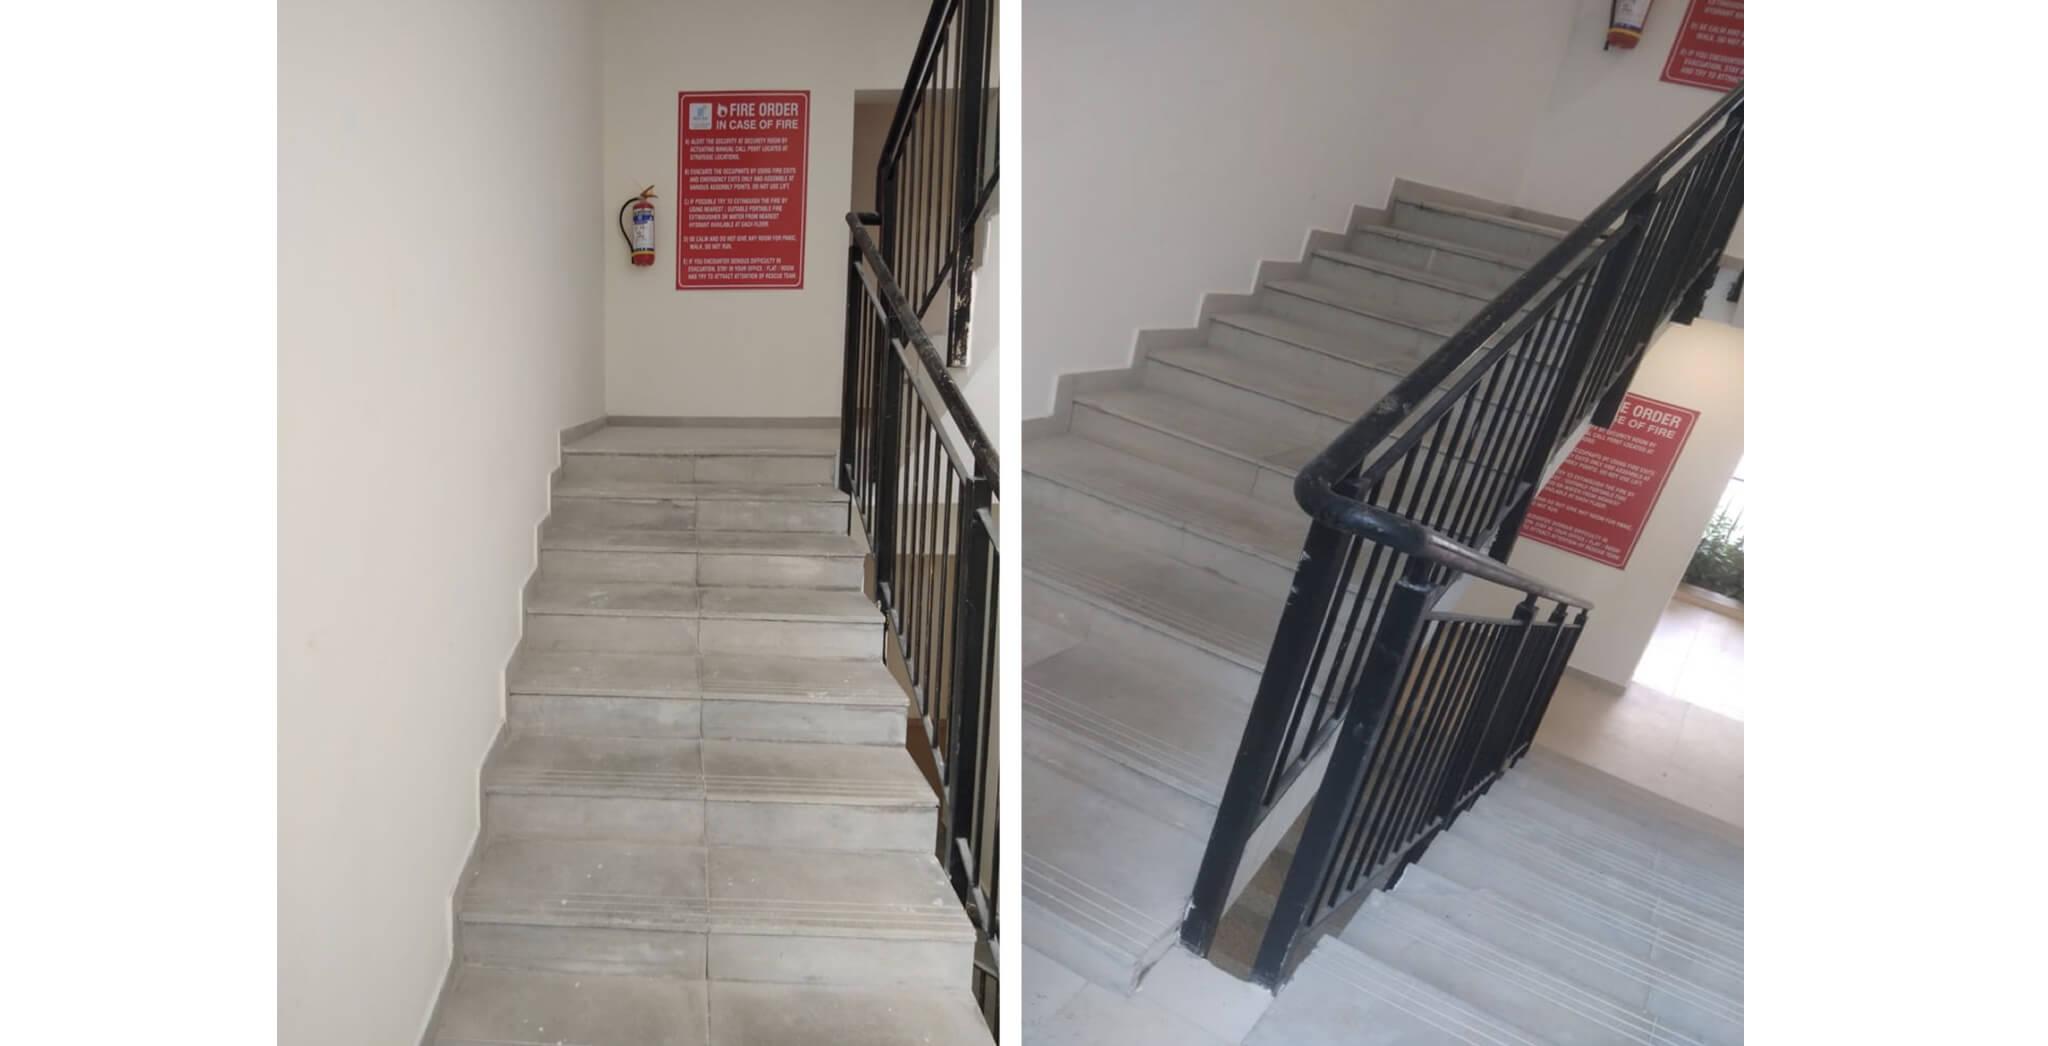 Nov 2019 - Deodar—B block: Staircase—Final coat of paint work-in-progress